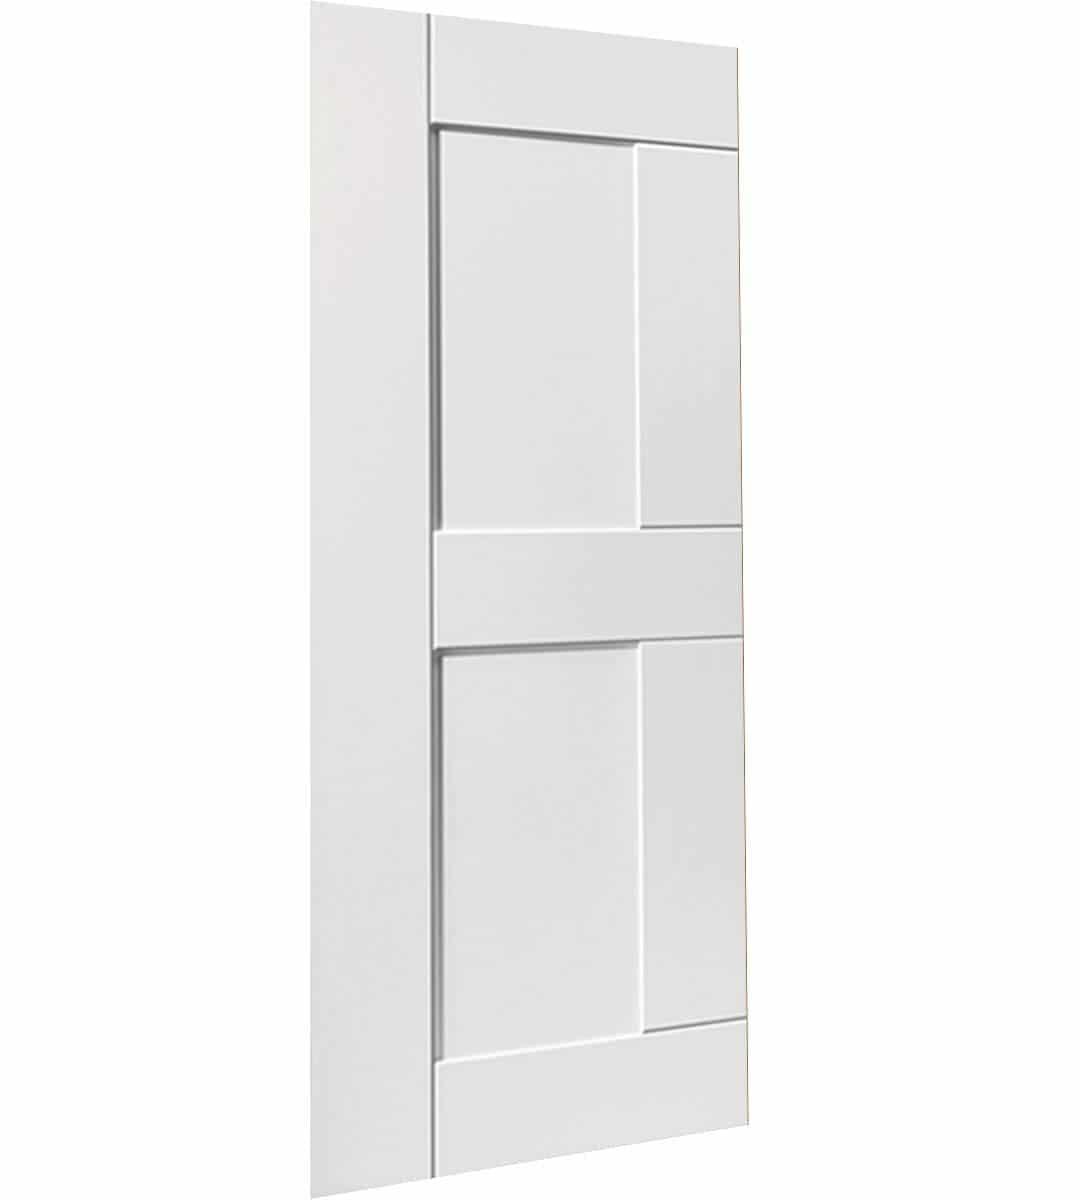 eccentro white internal door